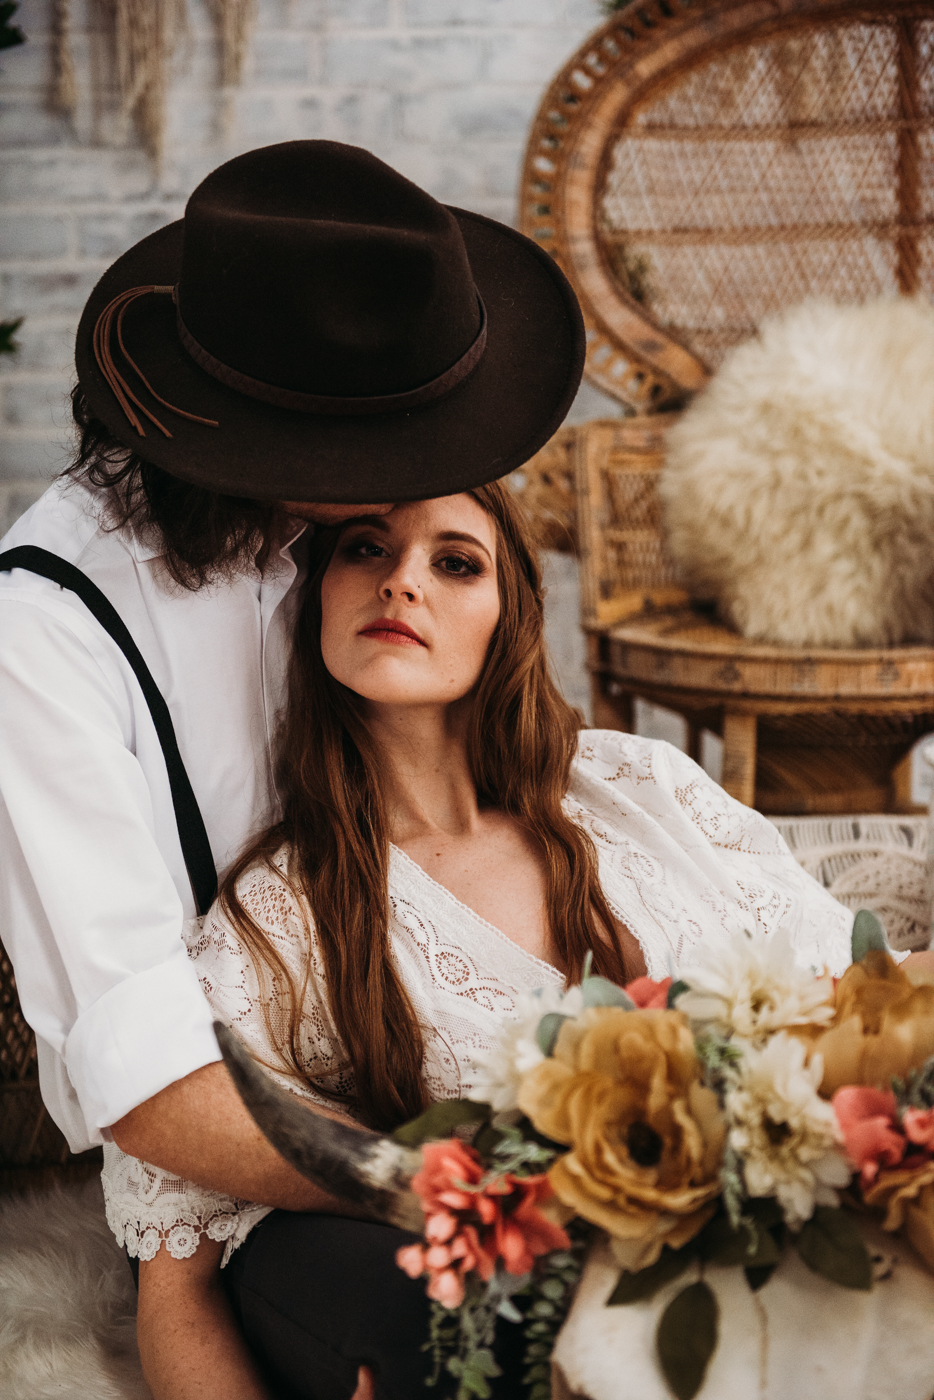 FortSt.John_photographer_TyraEPhotography_Wedding_Couple_Family_Photograhy_DawsonCreek_Elopement_Bride_Boduoir_Portraits-4801.jpg